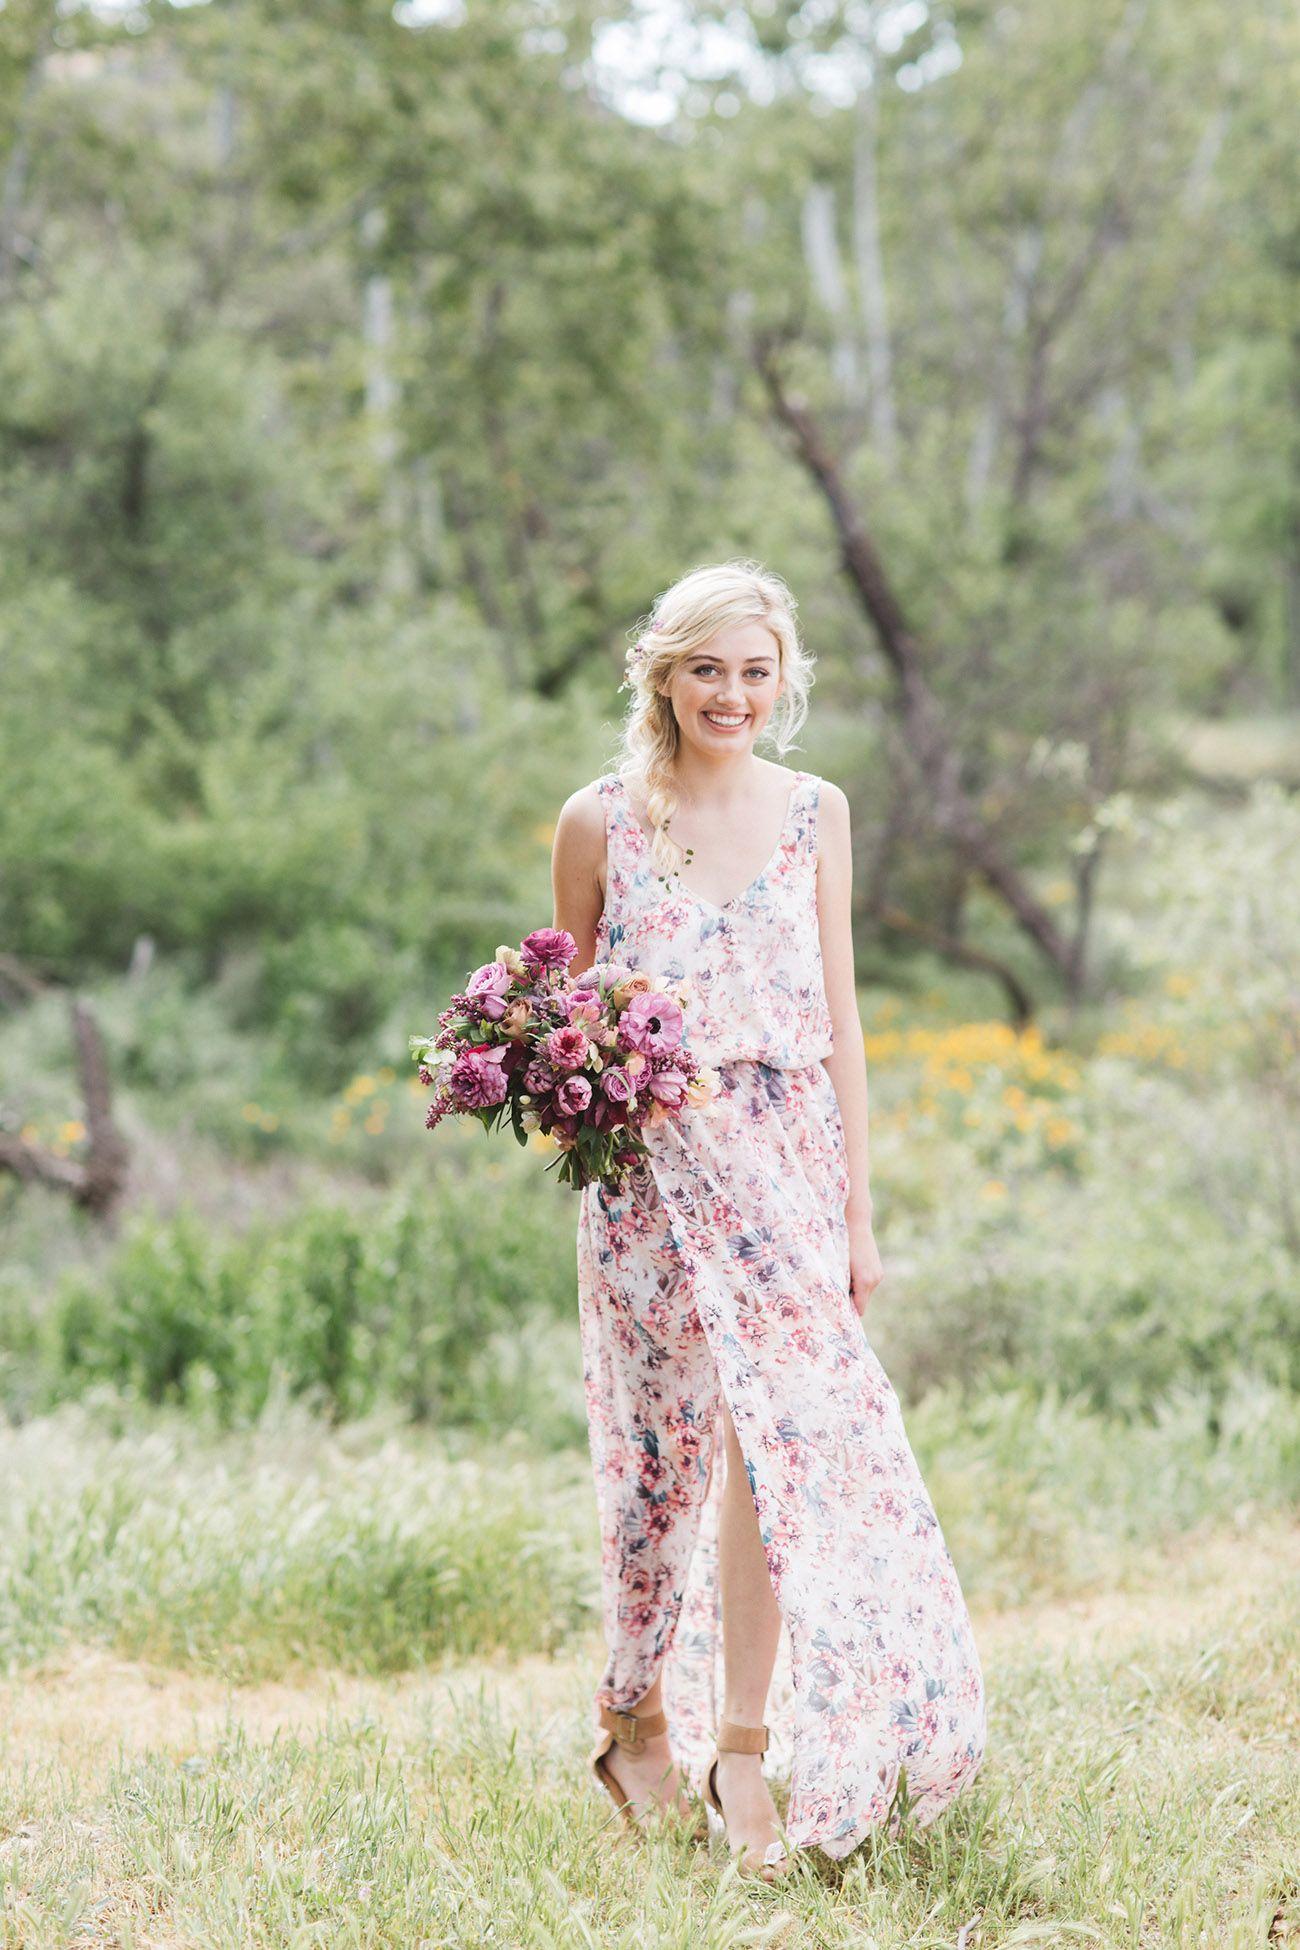 20e8d2fdfce4 Gorgeous Floral Print Bridesmaid Dresses for Wedding. GWSxMumu Kendall Maxi  Dress. Show Me Your Mumu ...